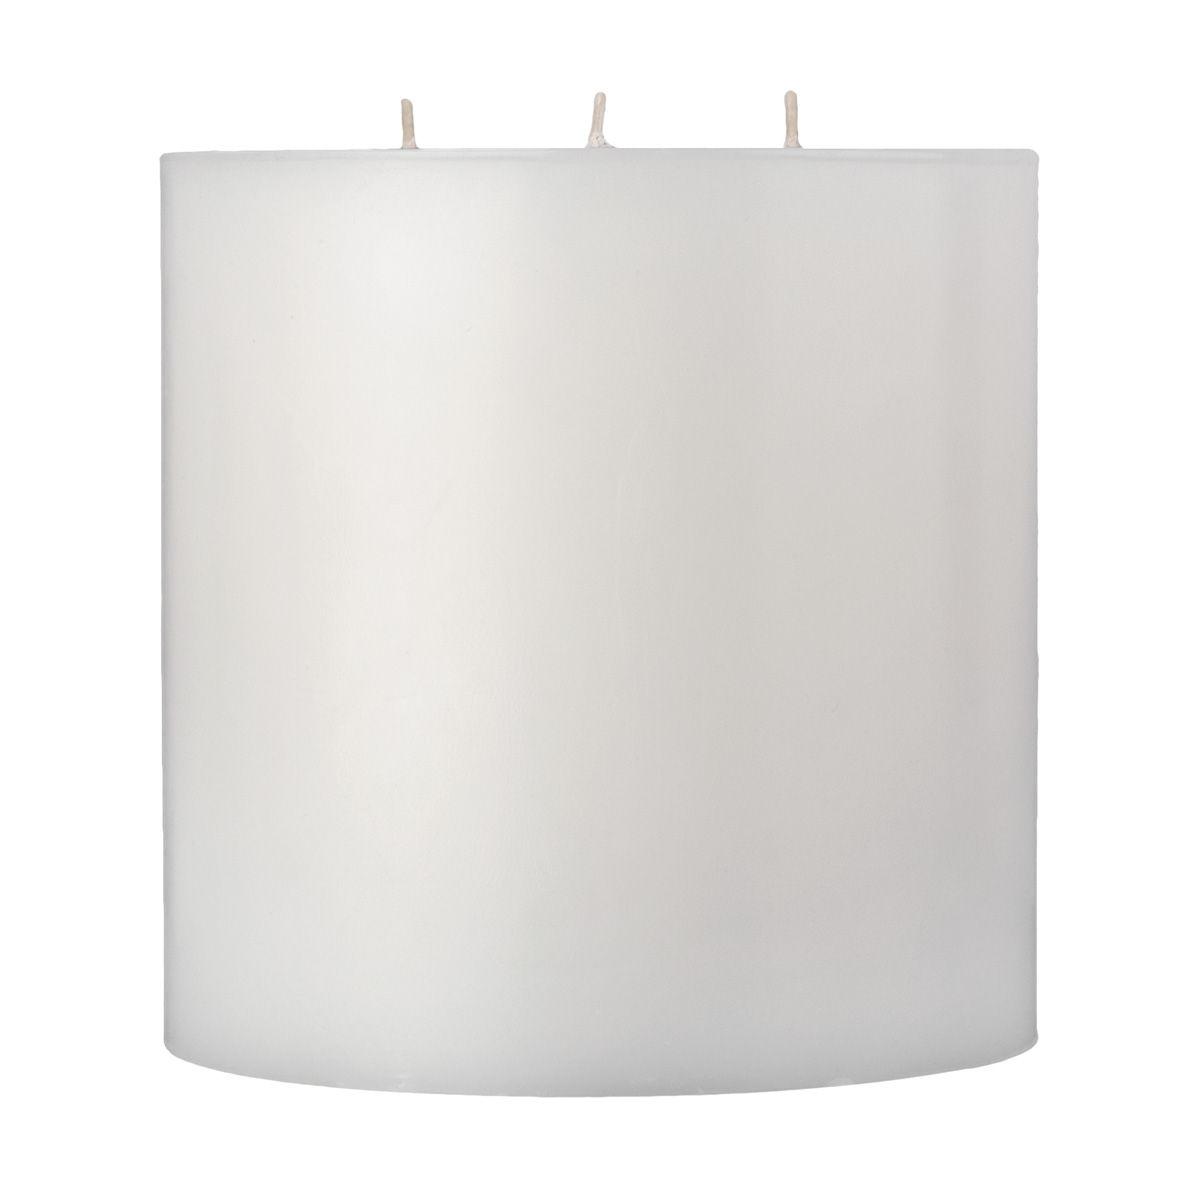 6x6 White 3 Wick Pillar Candle